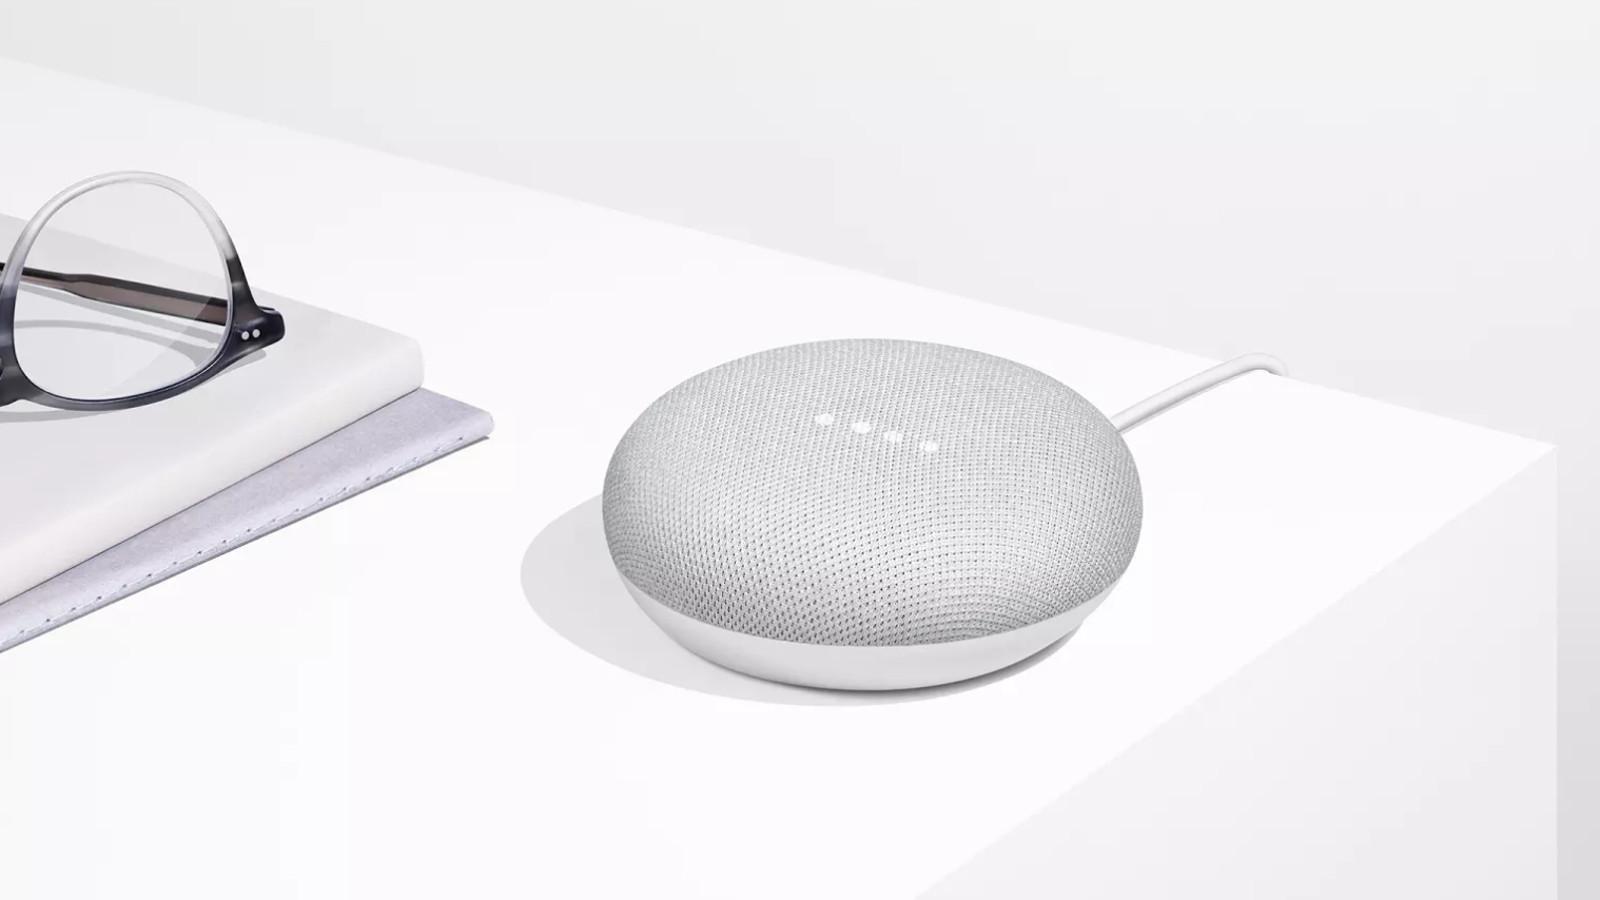 google home mini,google hardware,official image